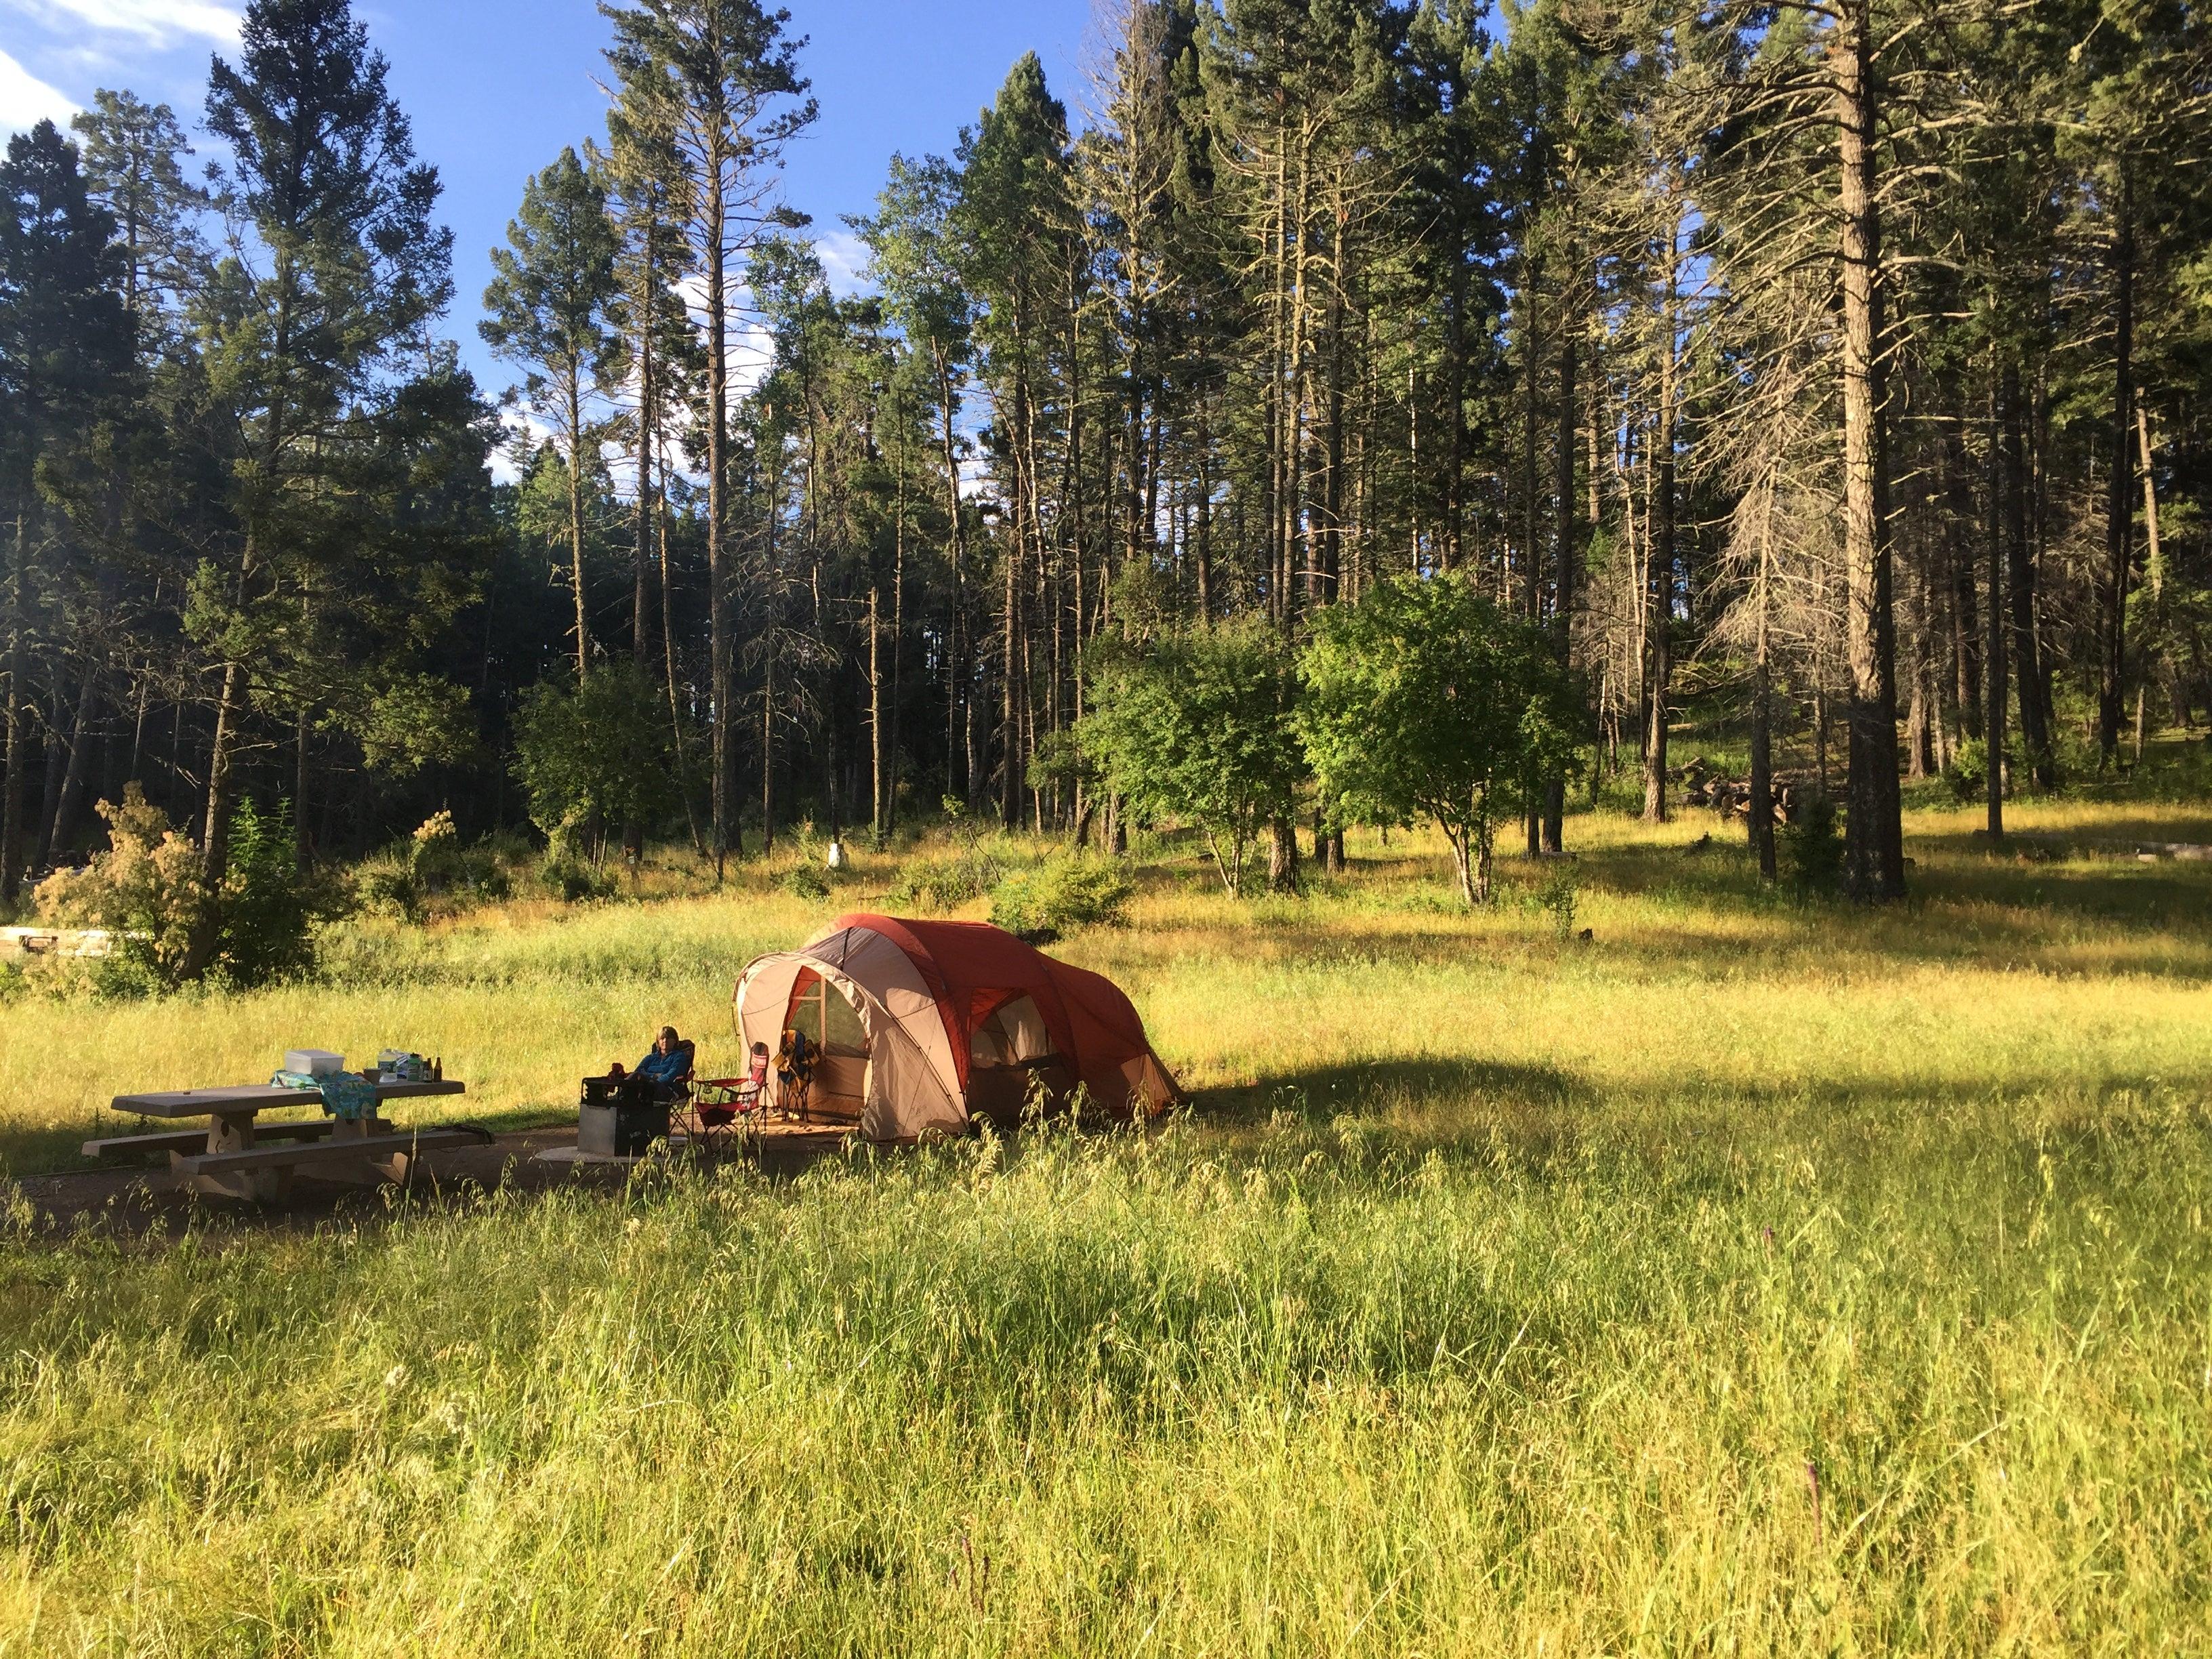 Camping in Guique